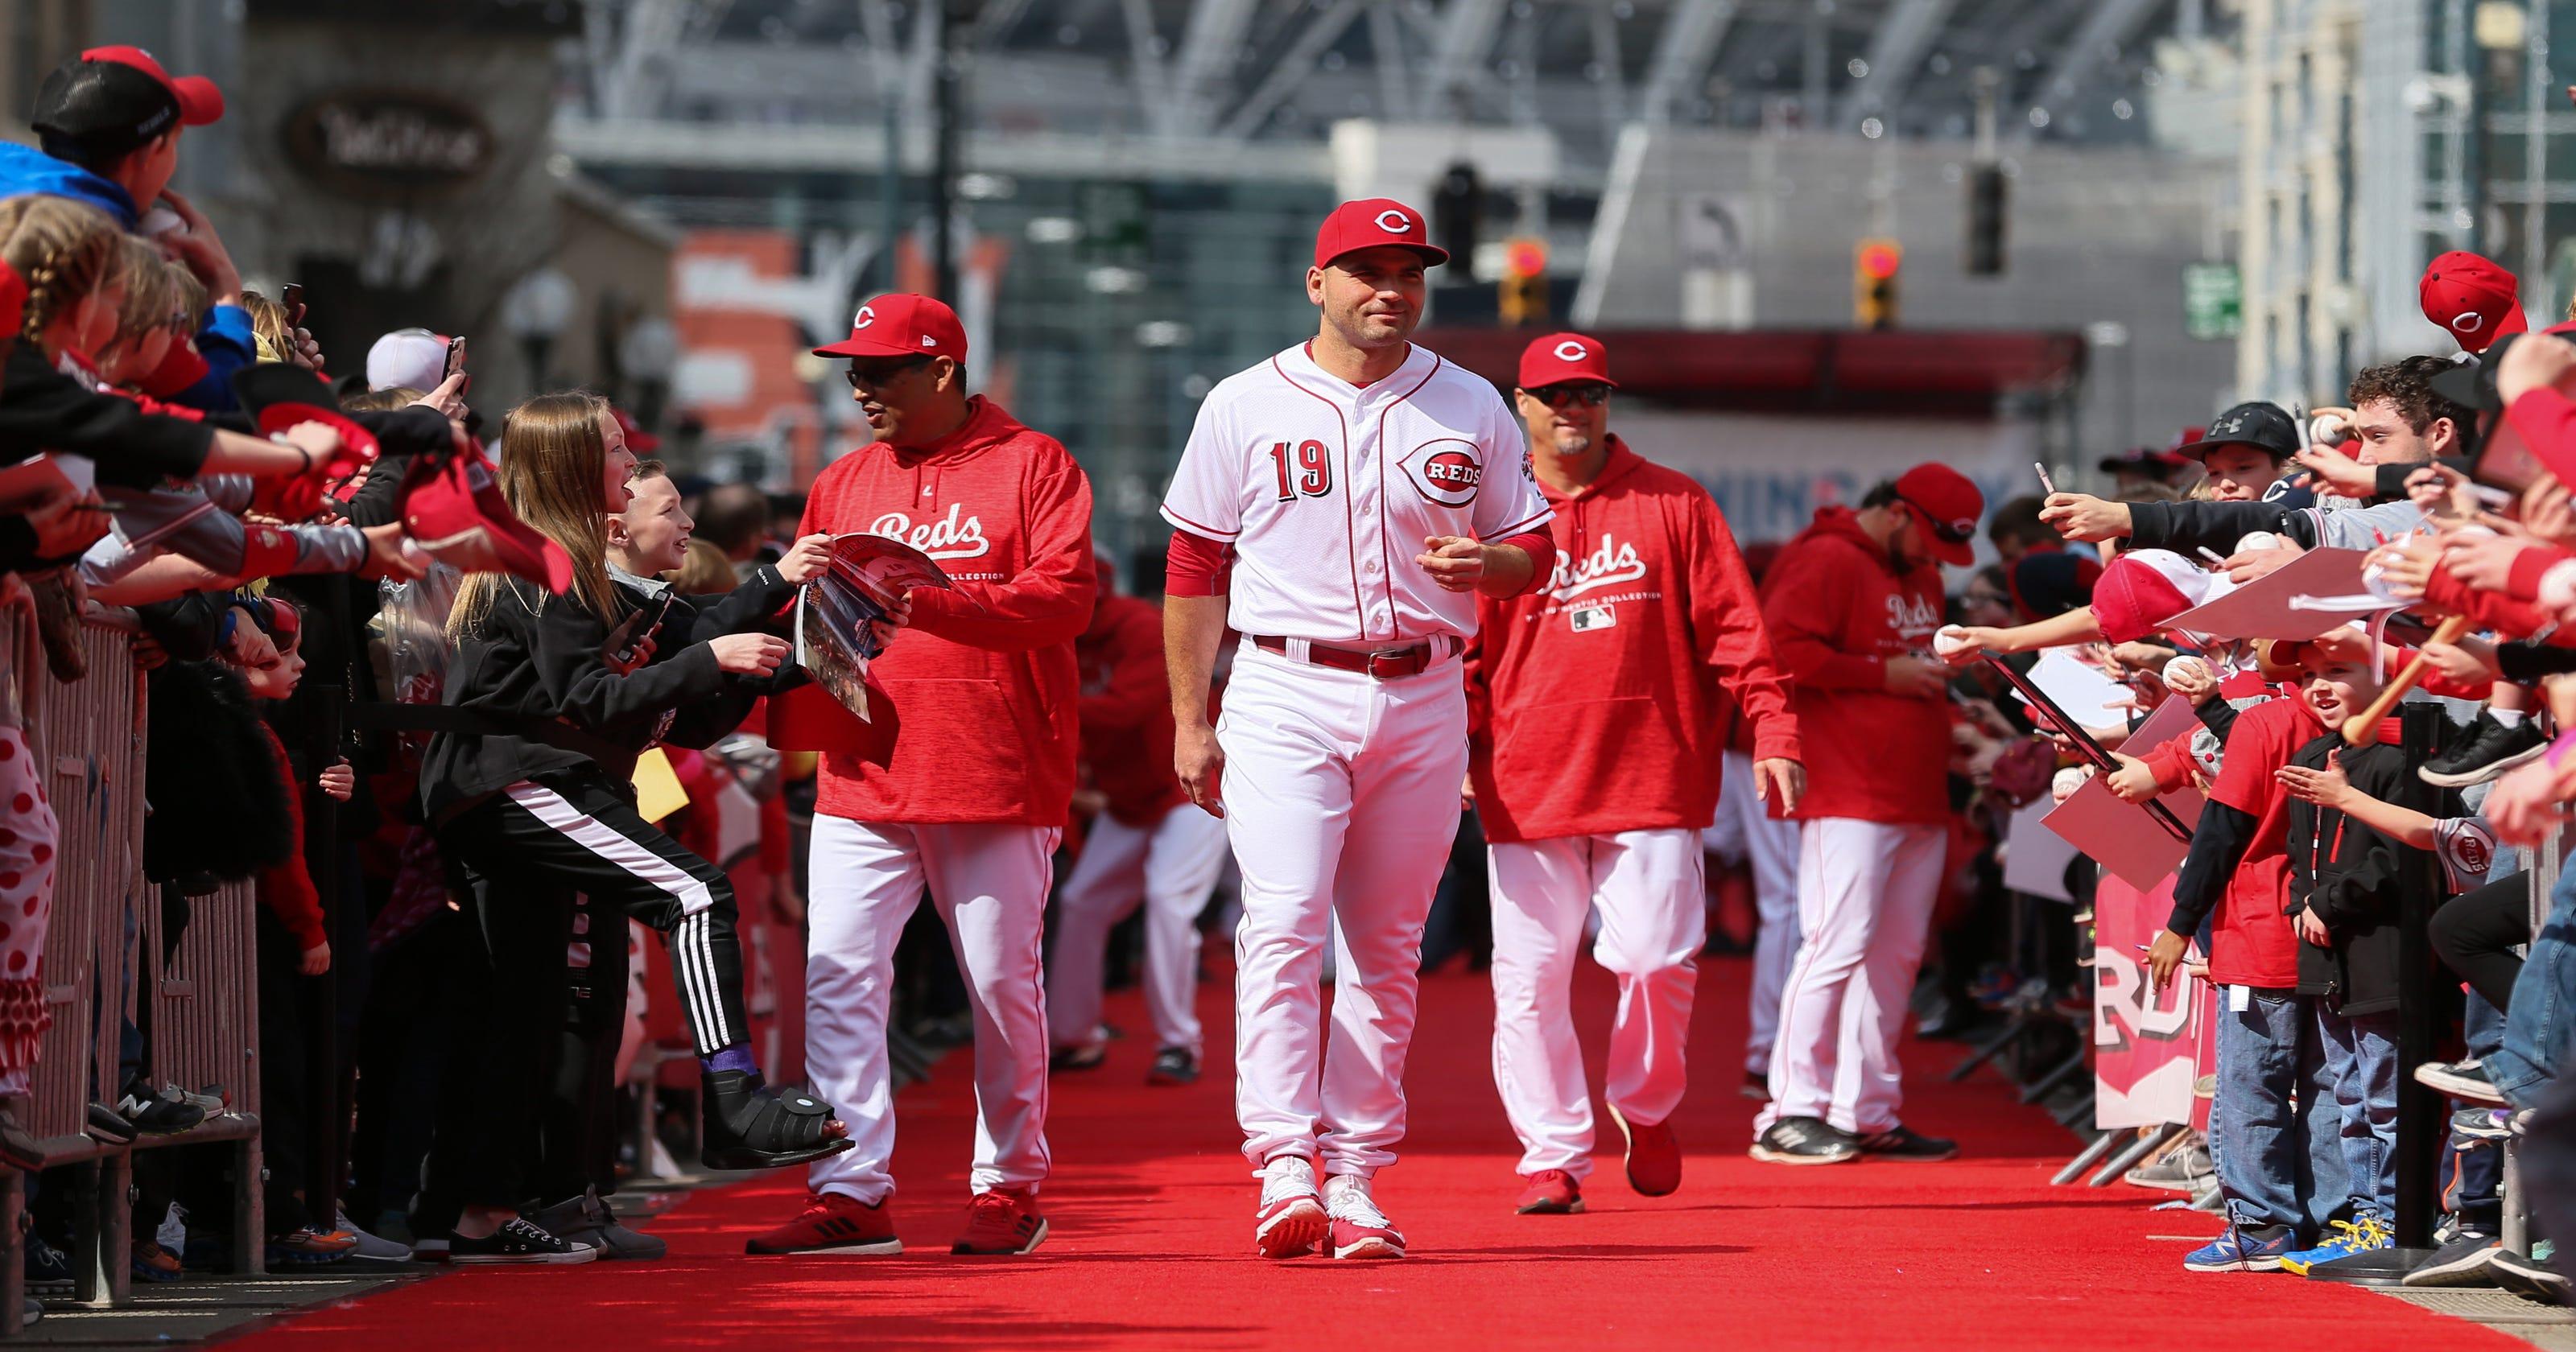 4c4c687f60f Cincinnati Reds Opening Day game and parade reunited next season